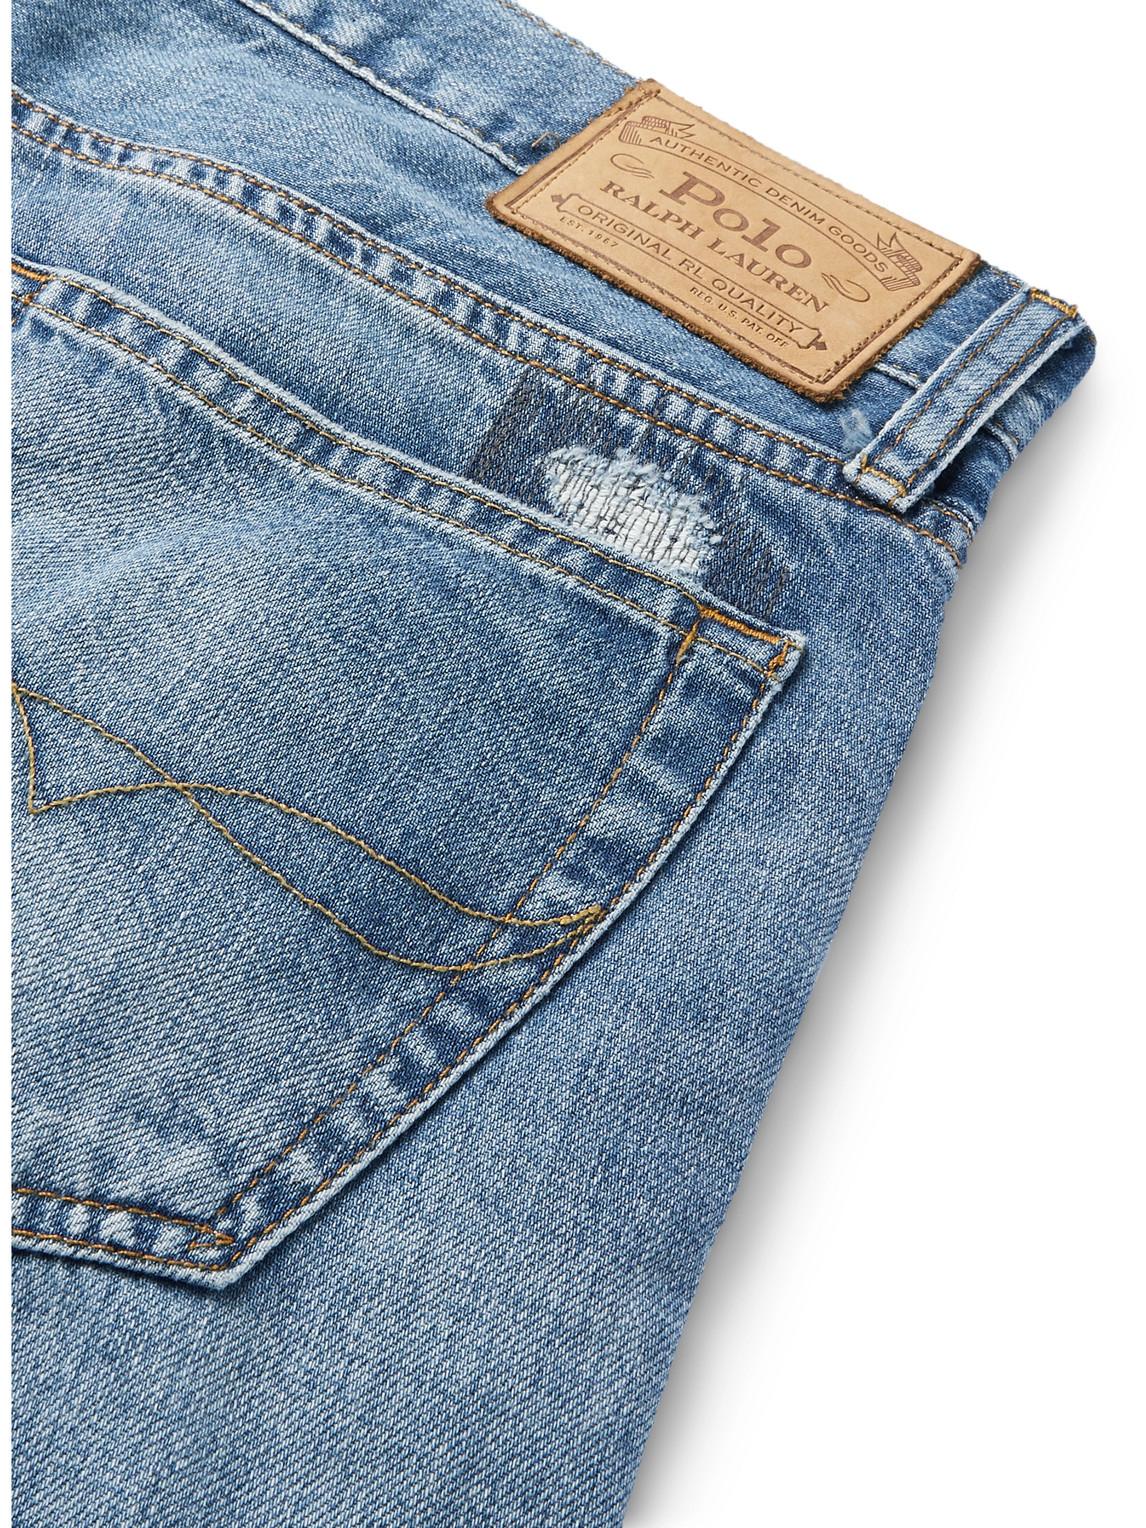 POLO RALPH LAUREN Straight jeans SULLIVAN SLIM-FIT DISTRESSED DENIM JEANS